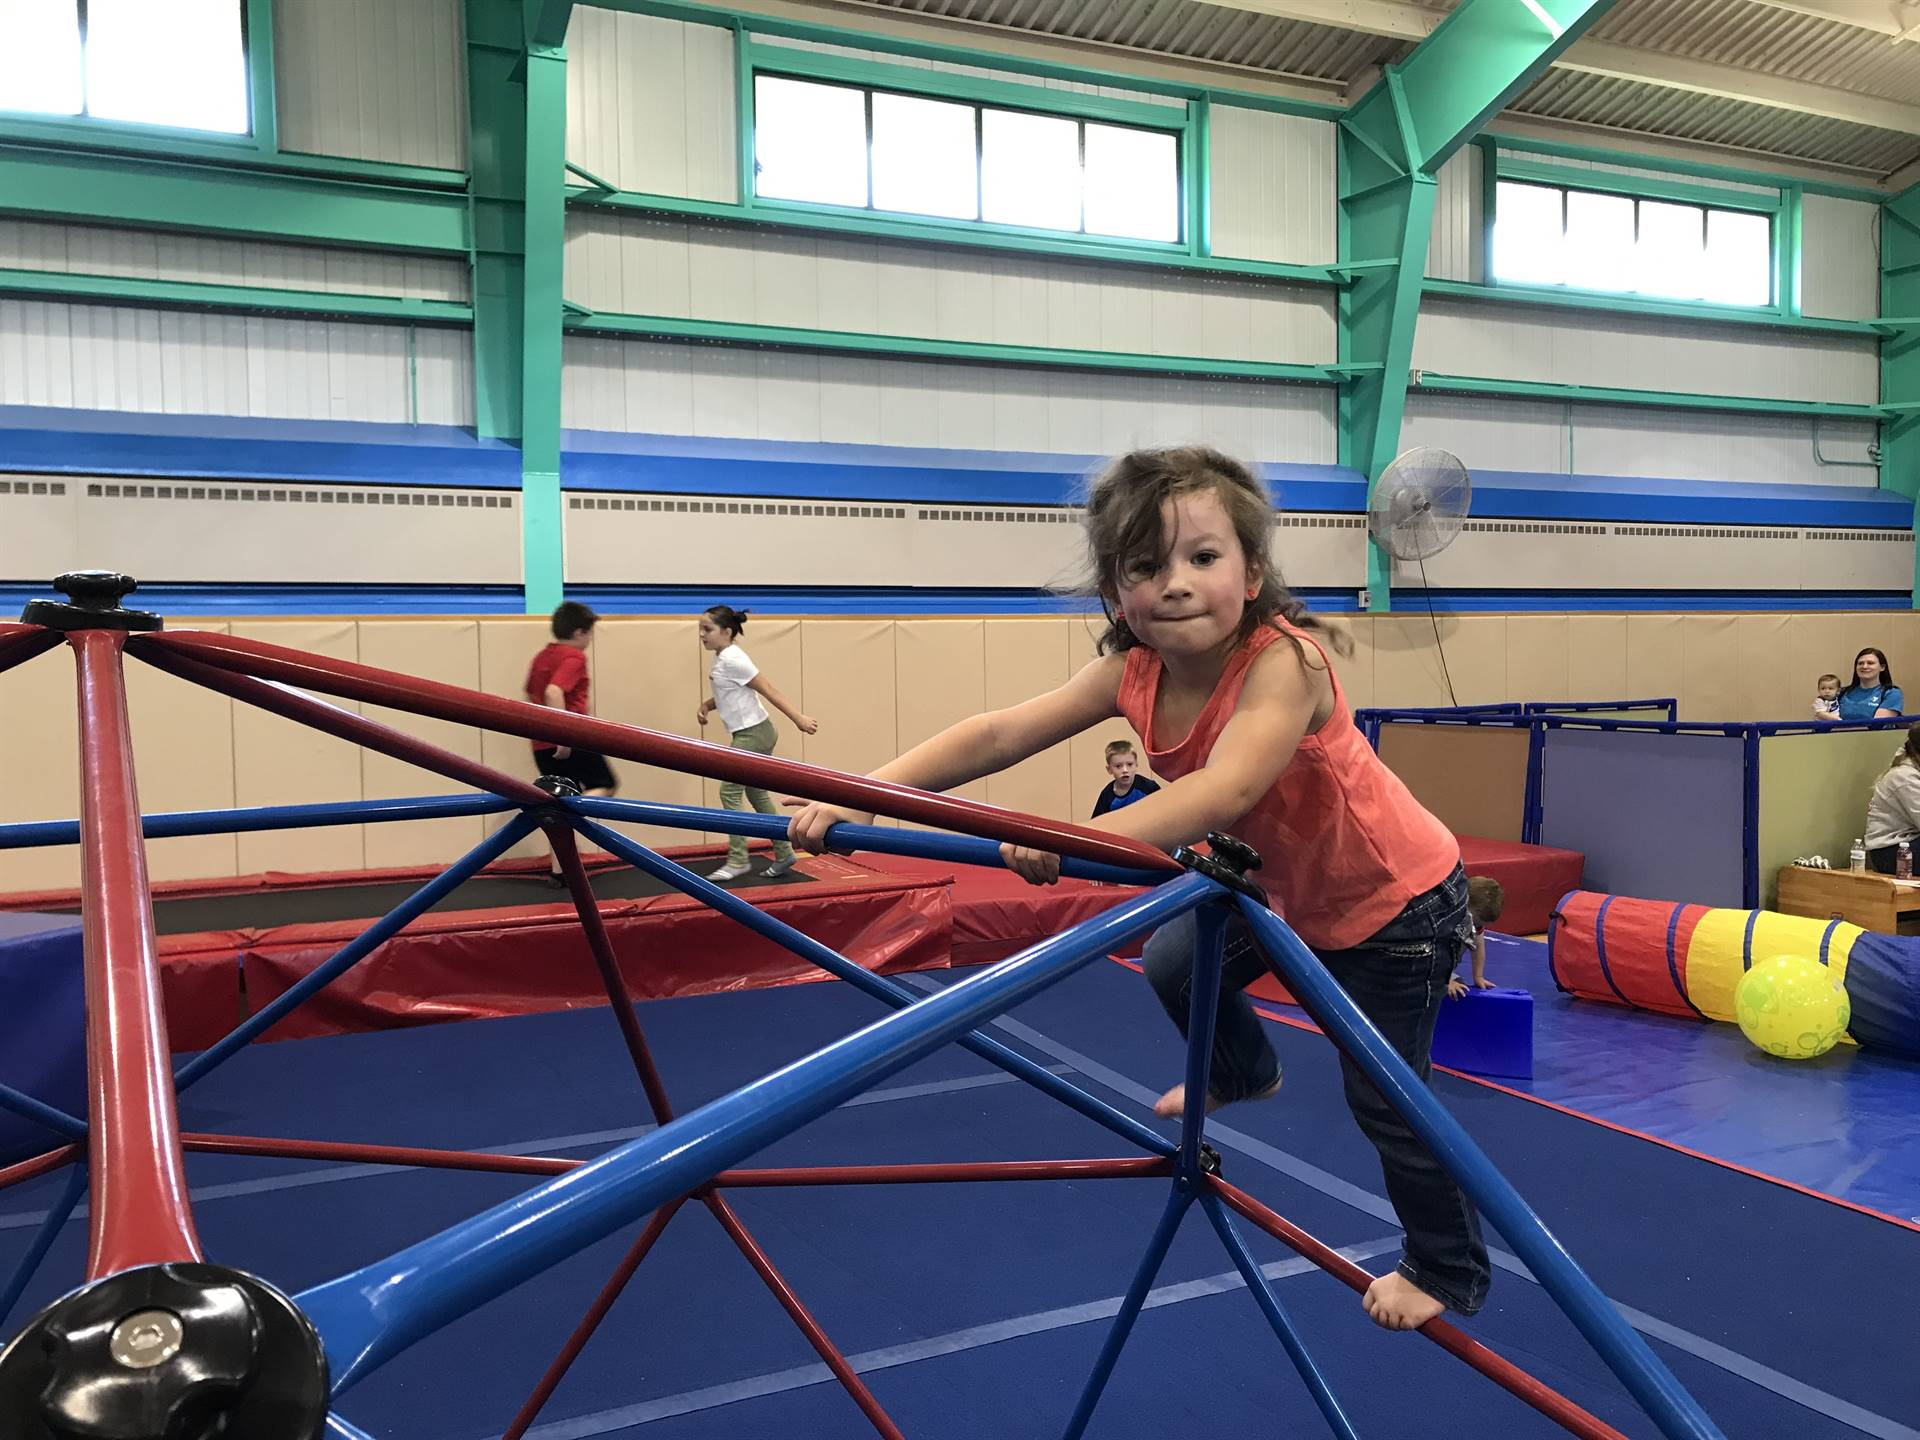 girl climbing on jungle gym